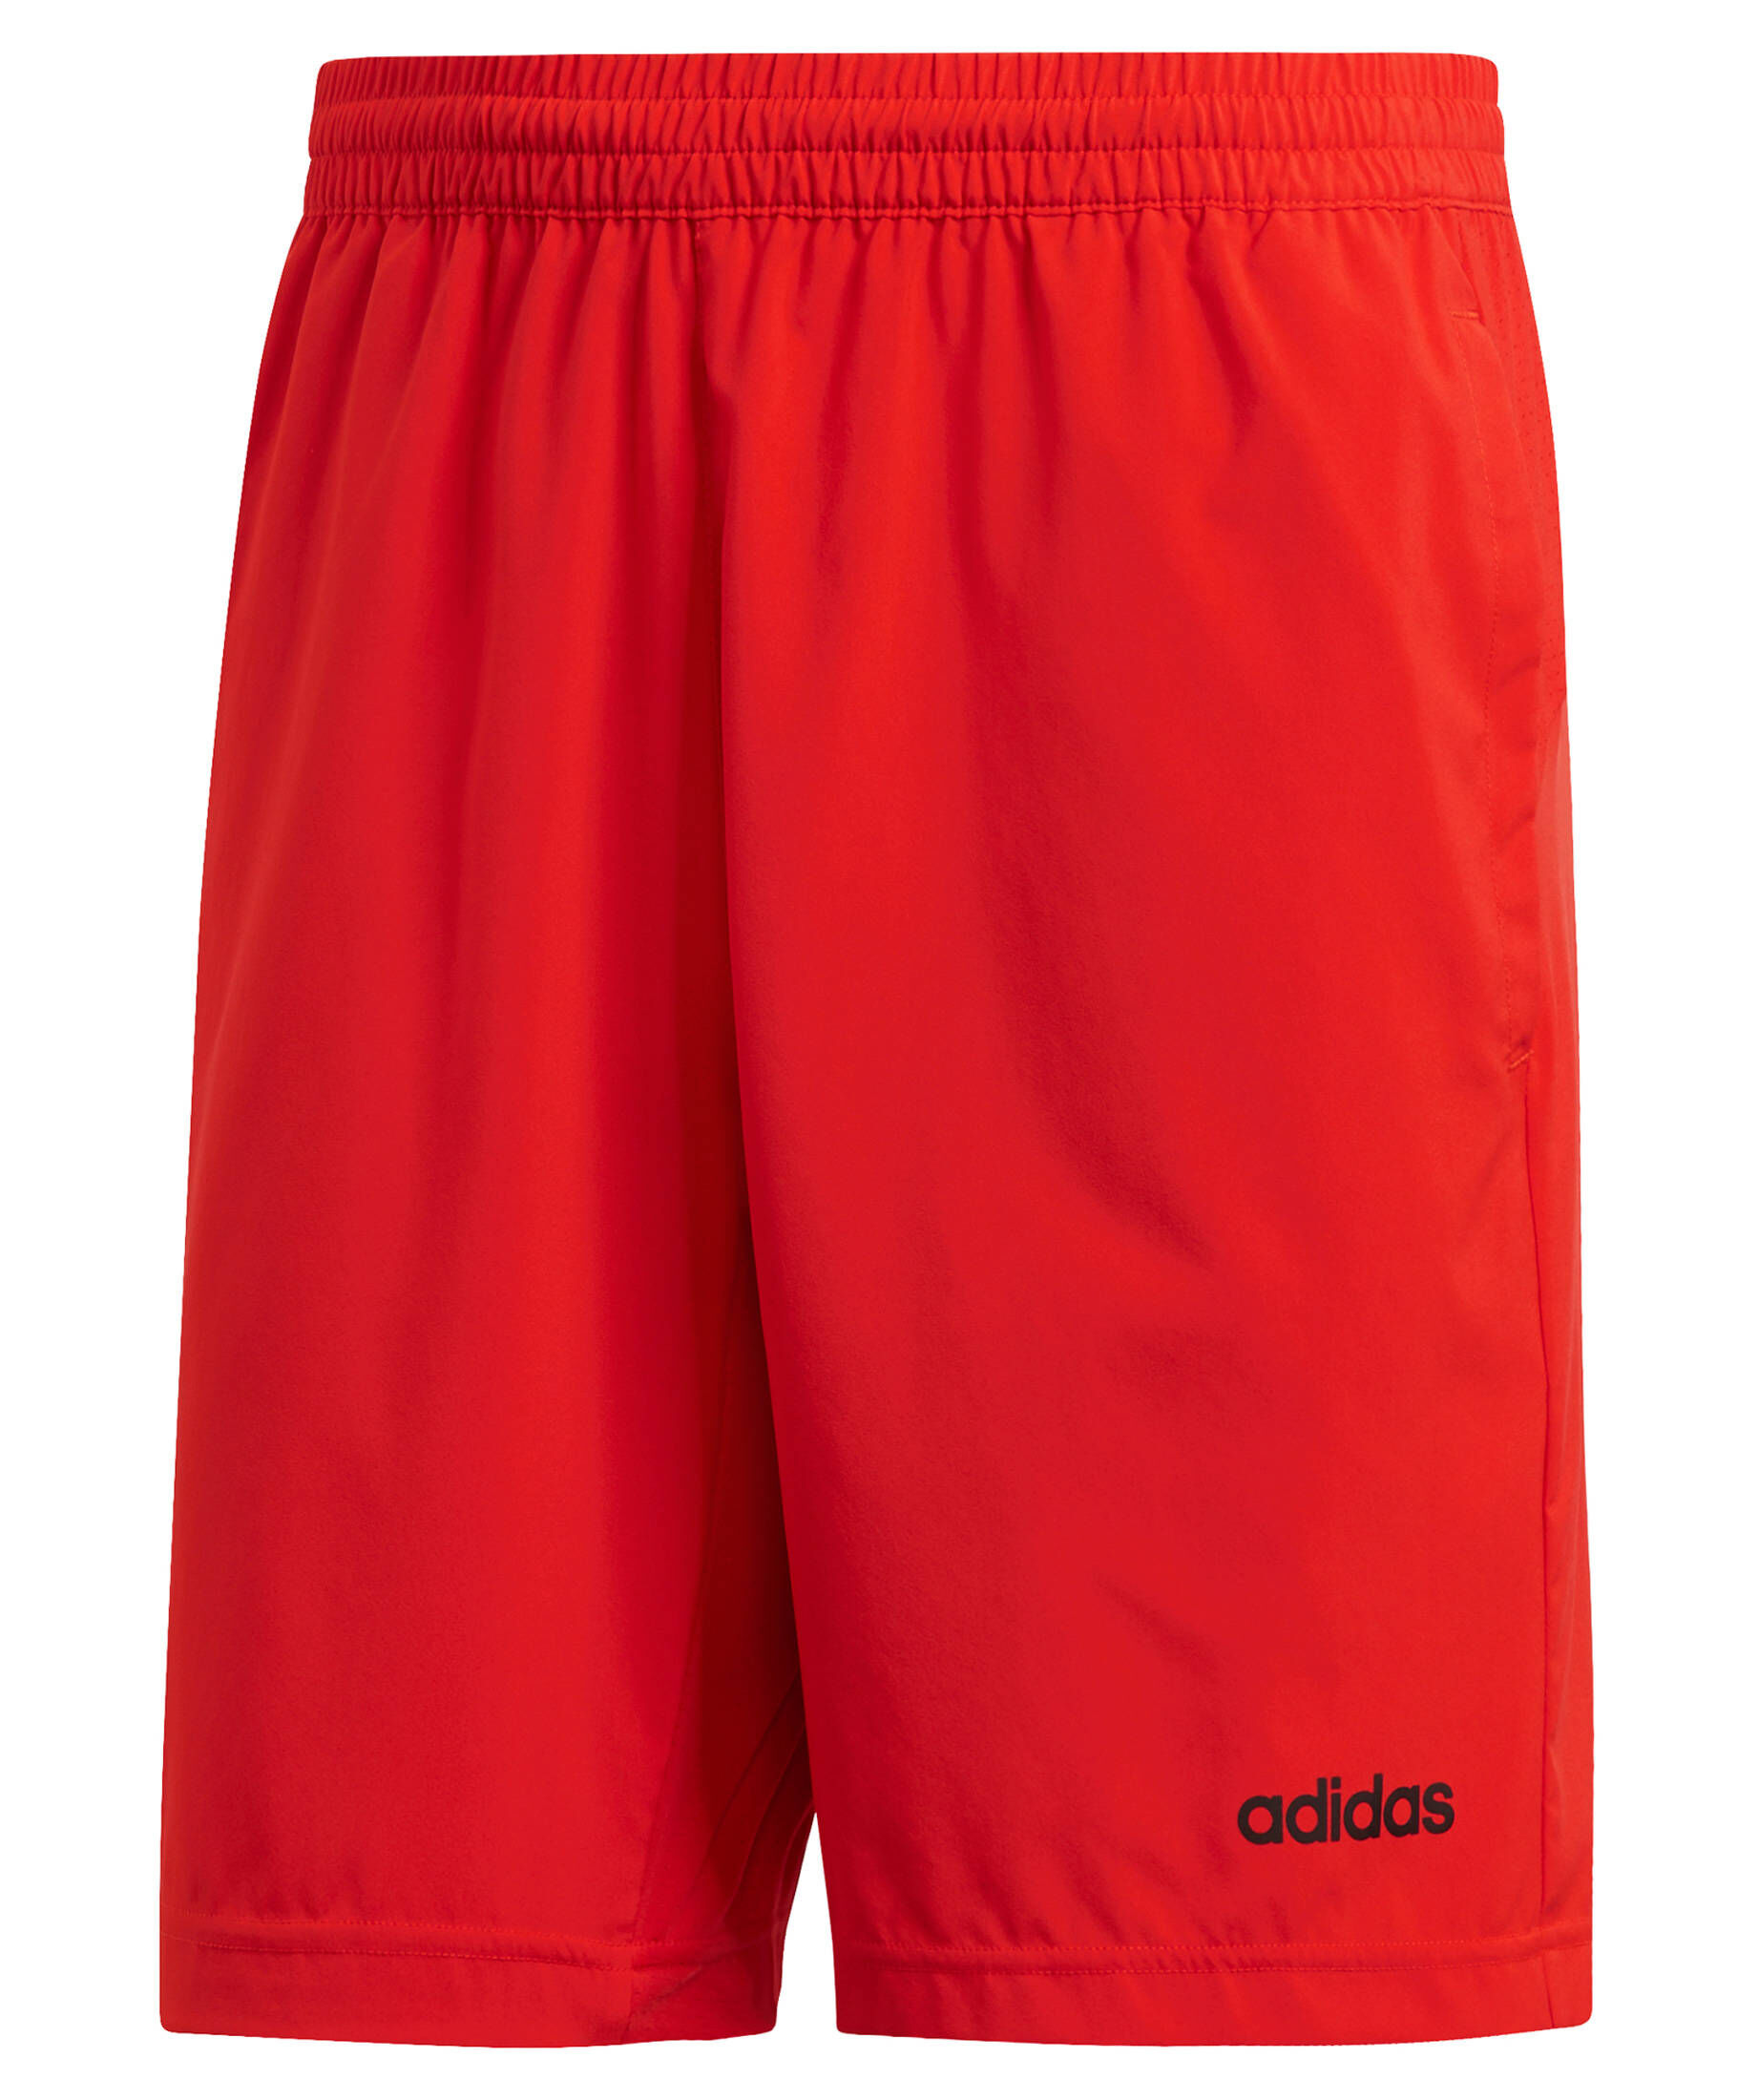 27 100 % Bw Maße 50 Xxxl Shorts & Bermudas Hose Bermuda Short Kurz Blau Via Cortesa Gr